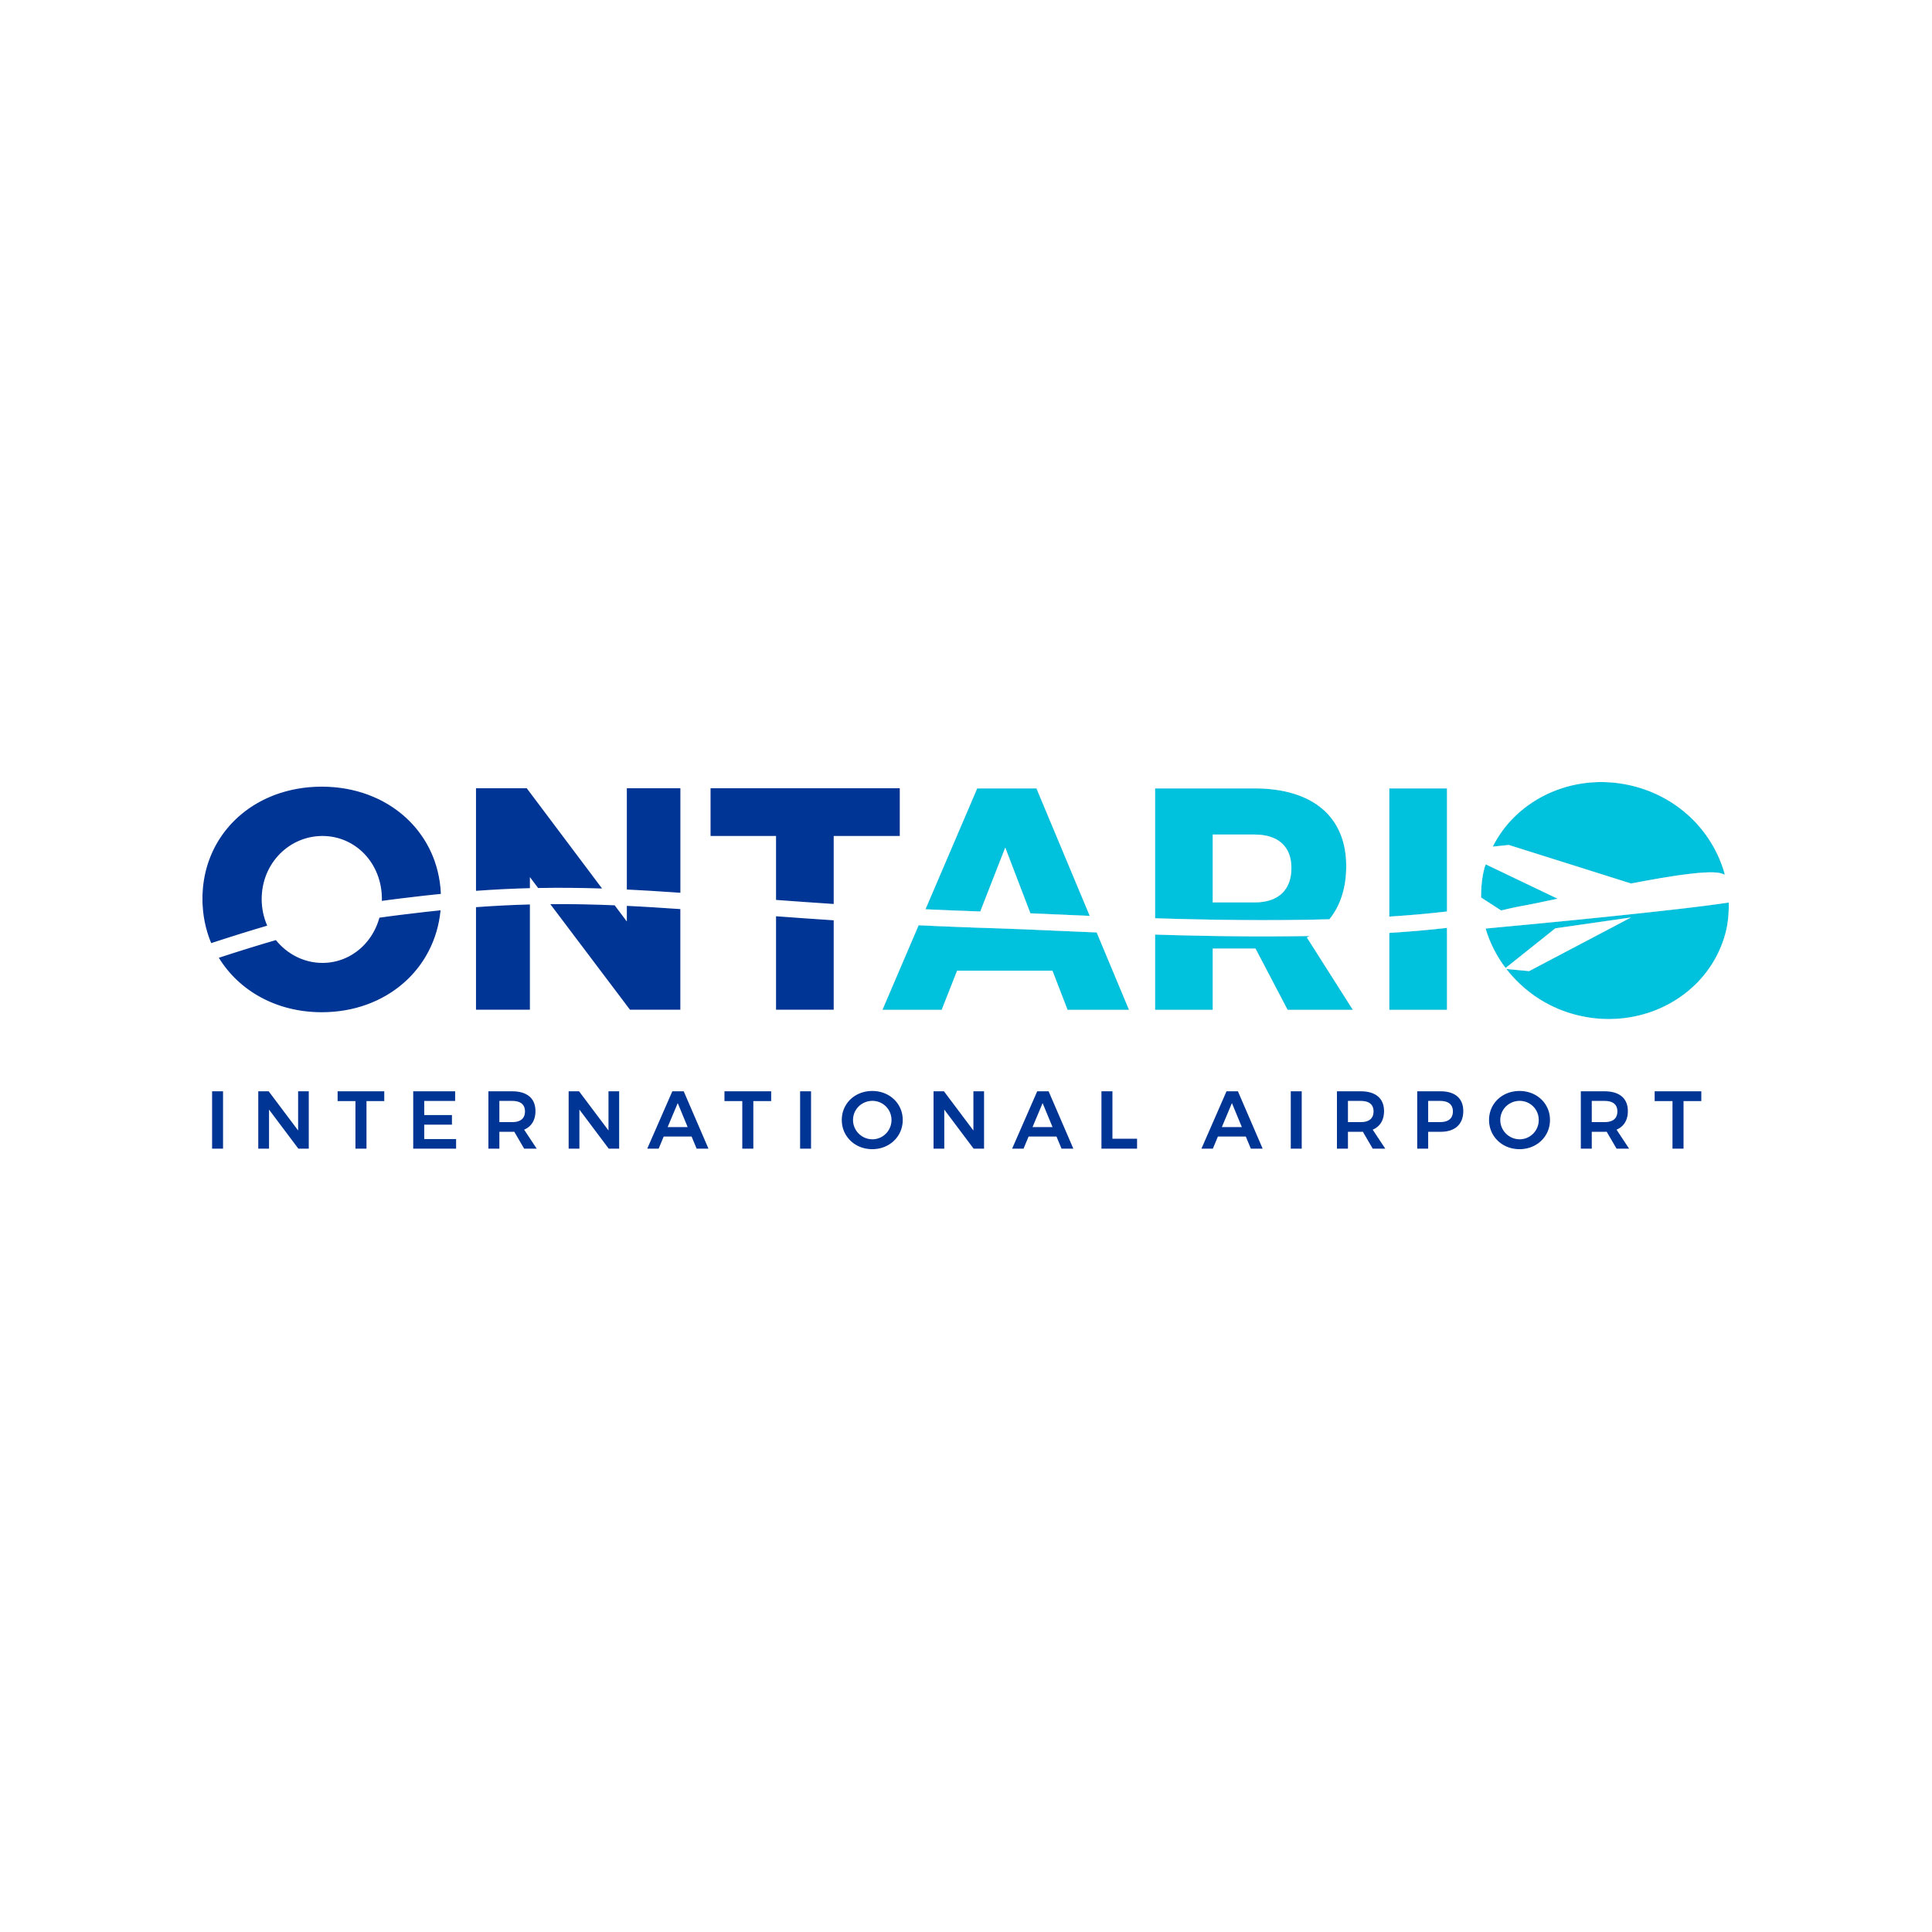 8409-2-OntarioInternationalAirport_Logo_1.jpg